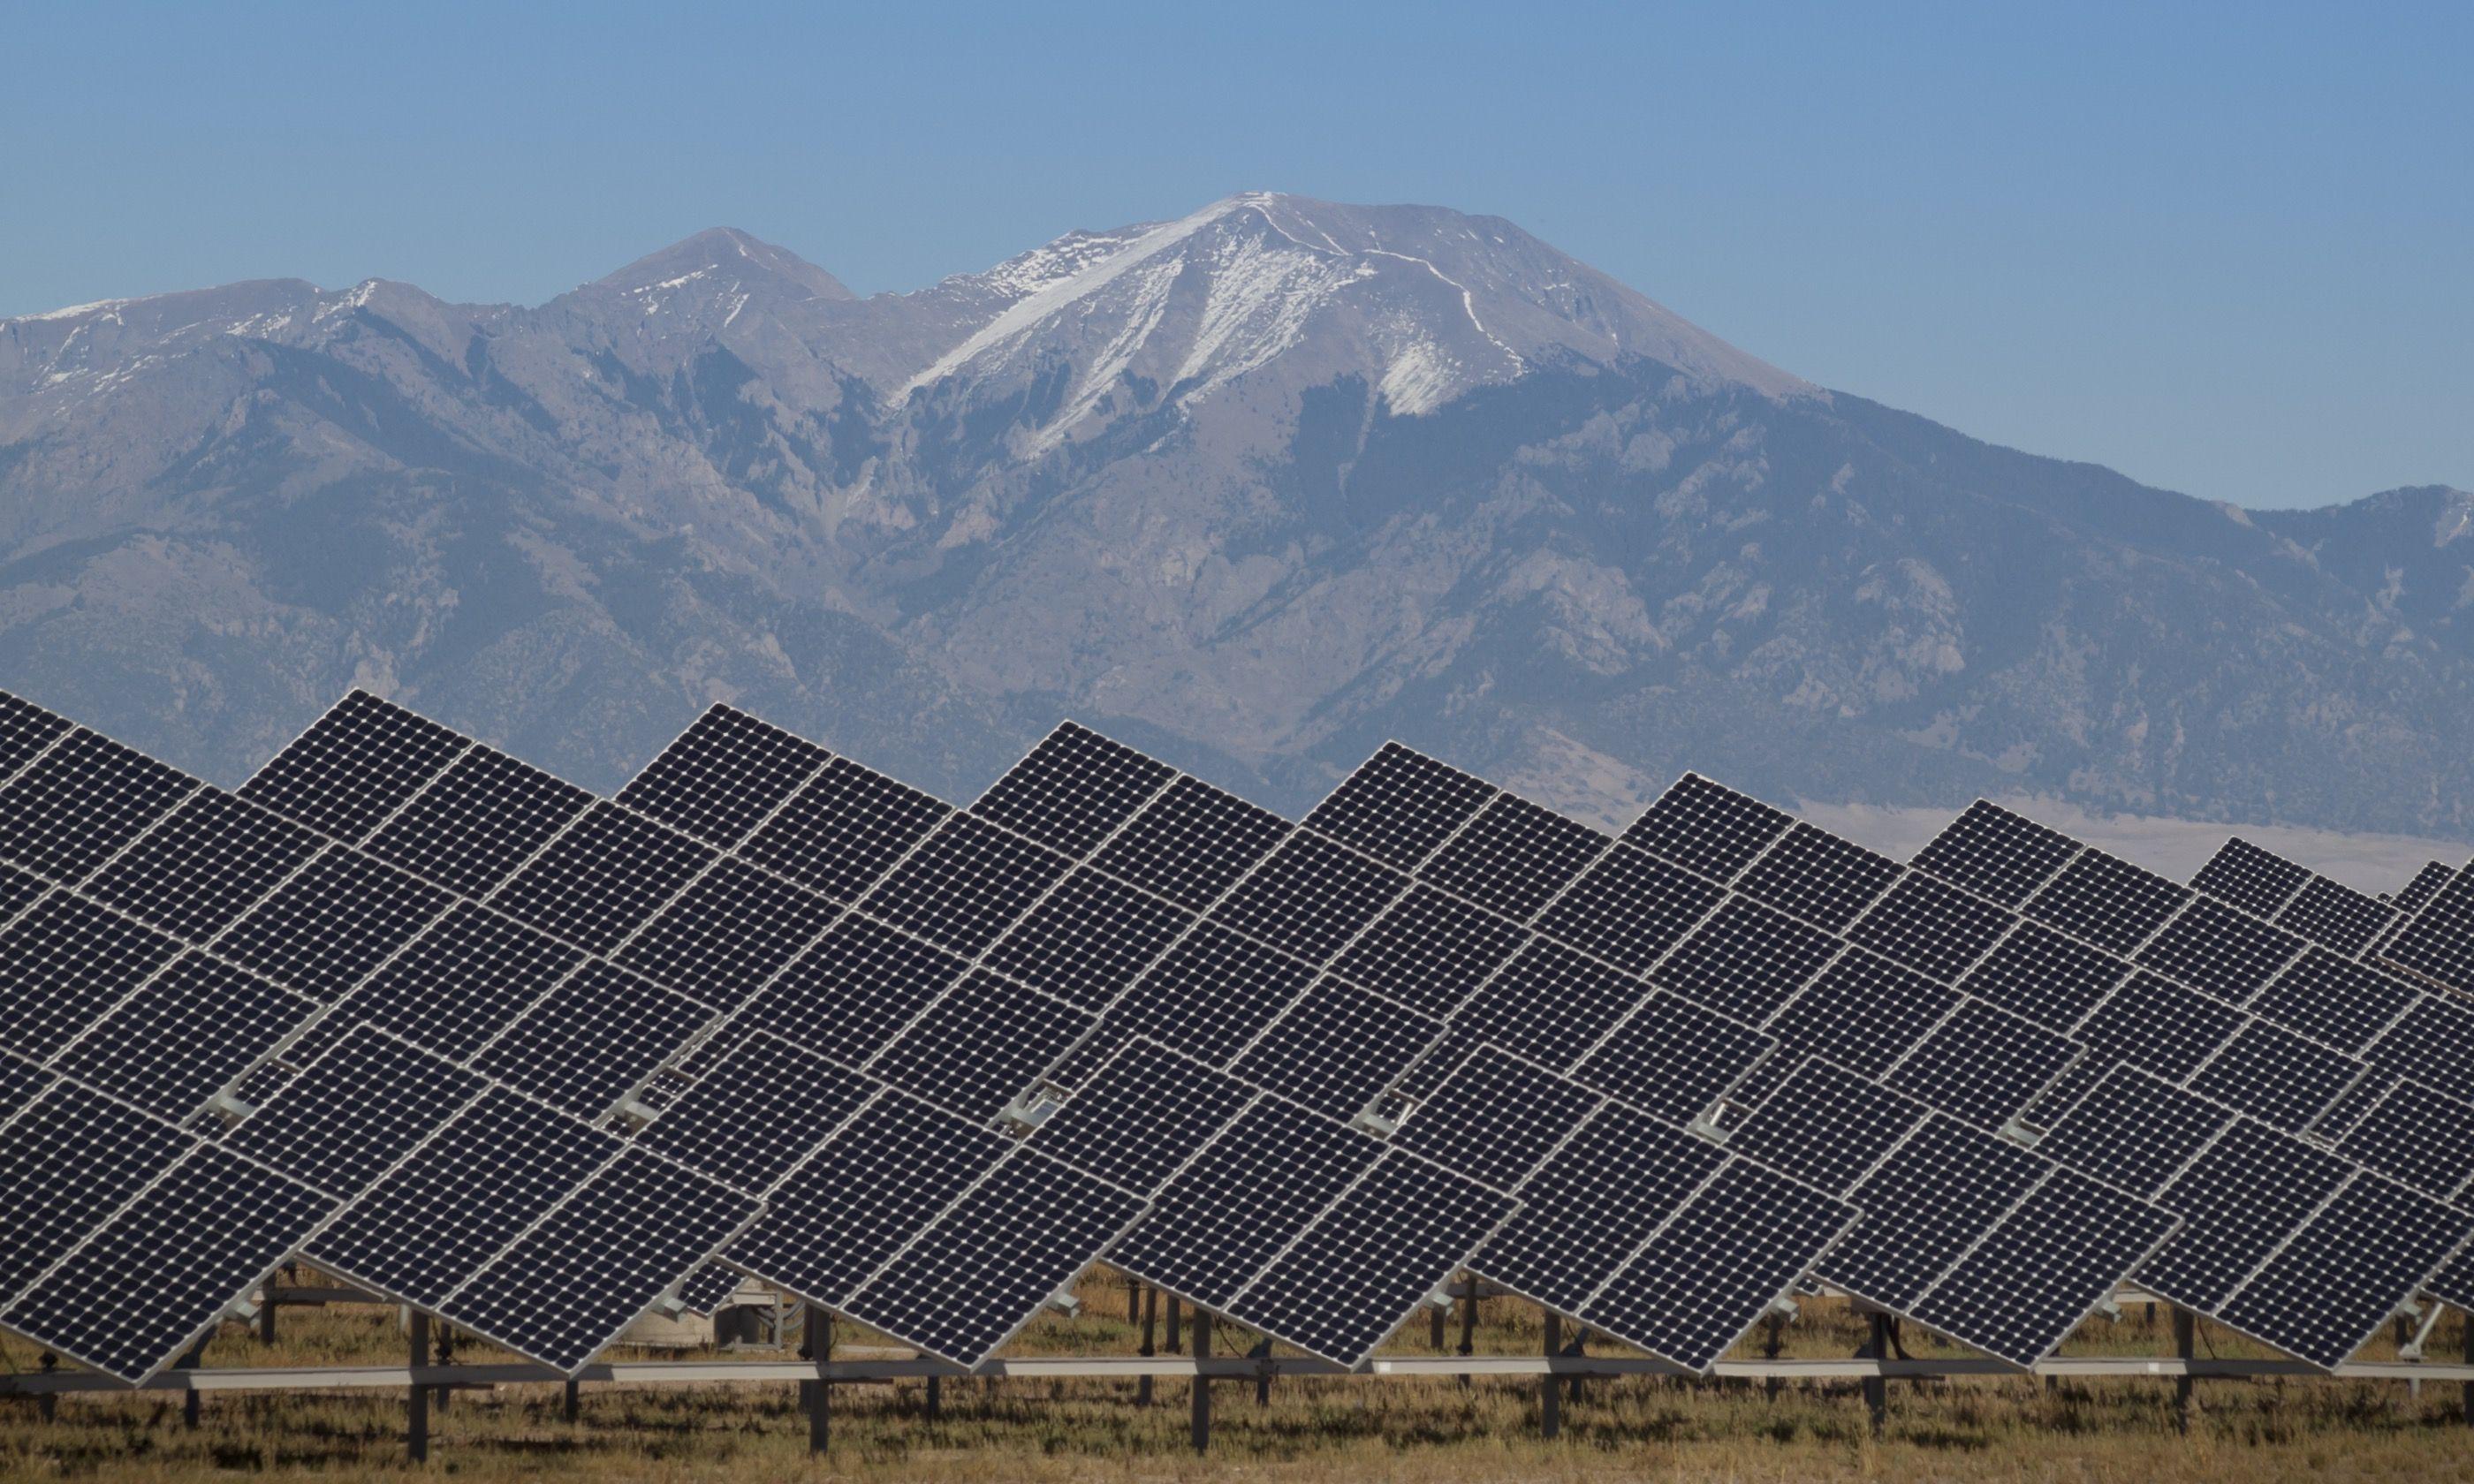 Solar power plant, San Luis Valley, Colorado. Or is it? (Shutterstock.com)